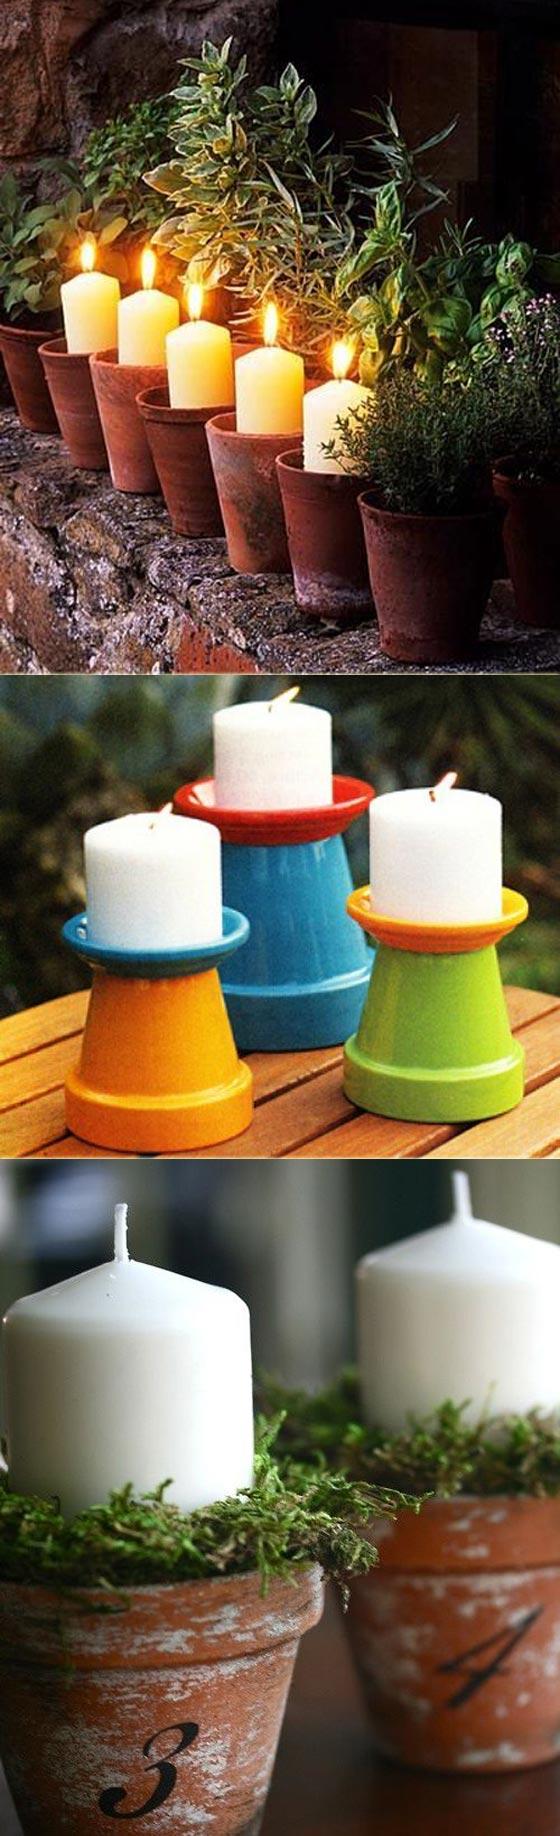 Candles in Little Terracotta Pots